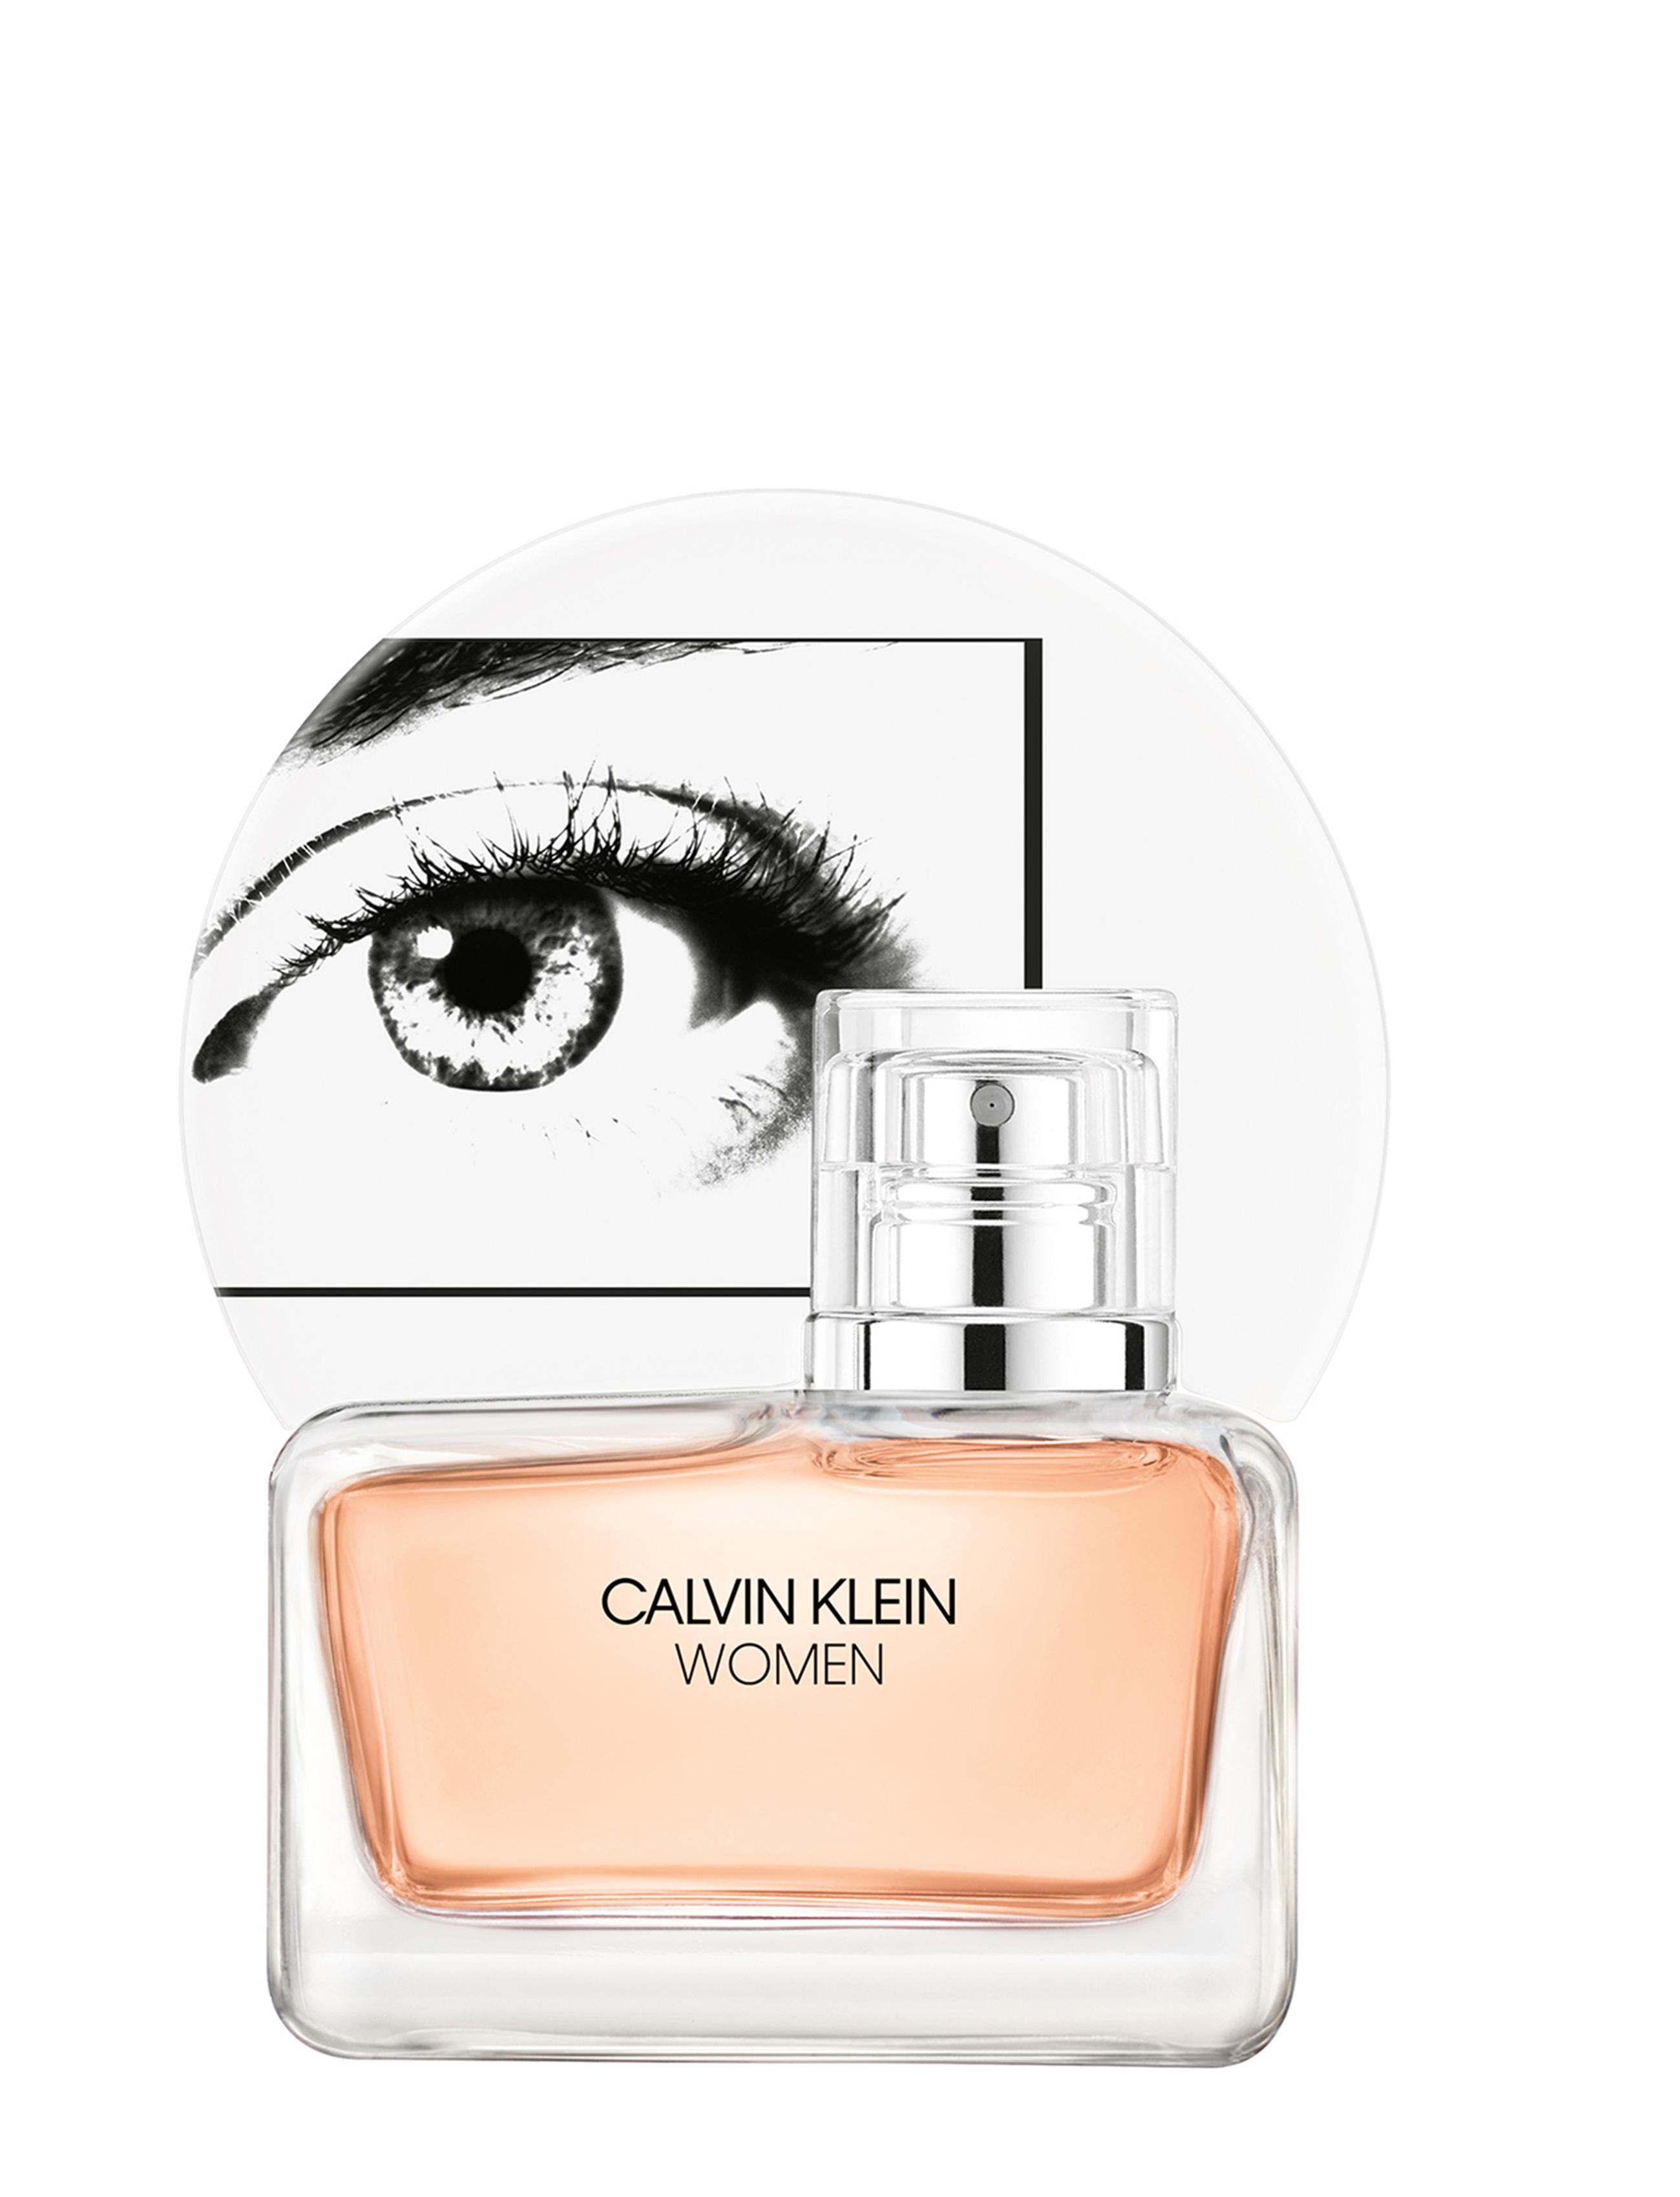 Calvin Klein Women Intense EDP, 50 ml